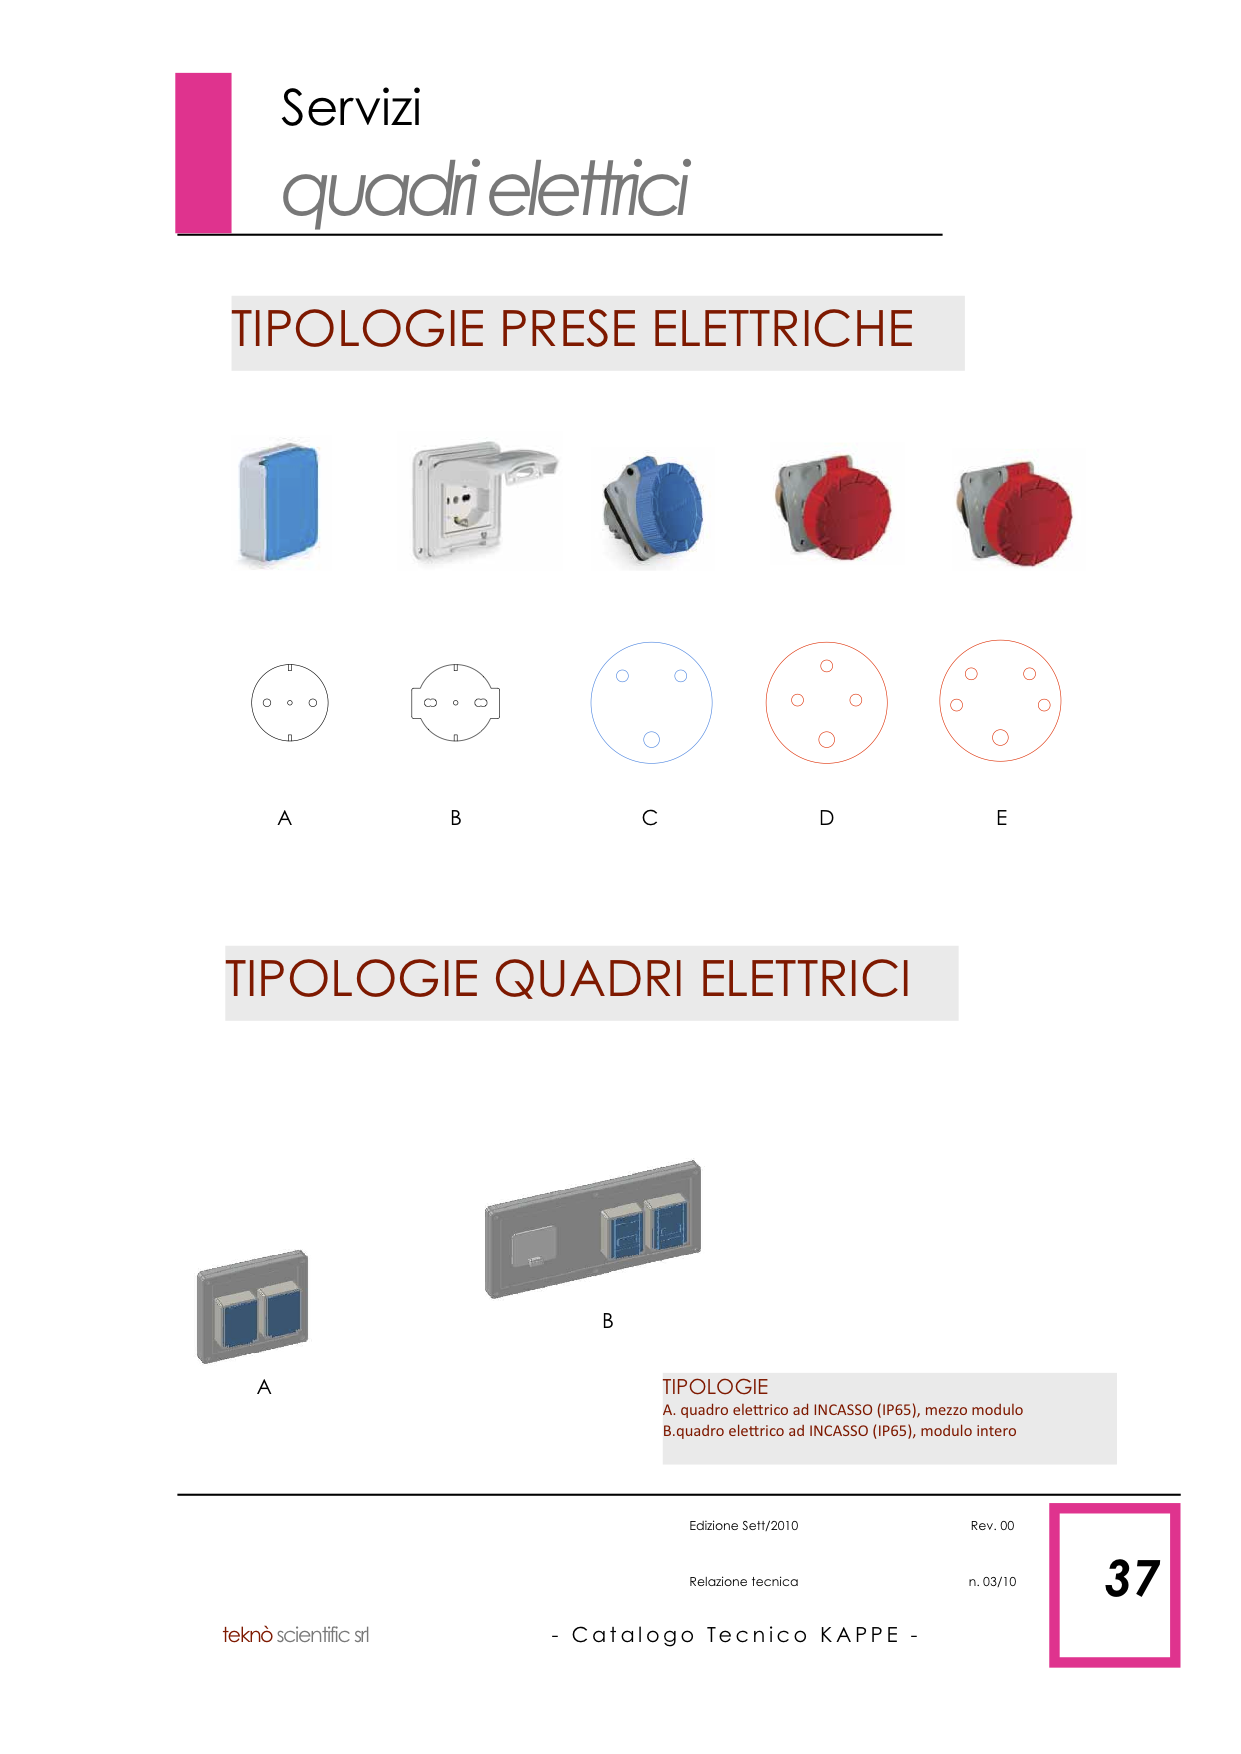 KAPPE Catalogo Tecnico Generale copia 7.png